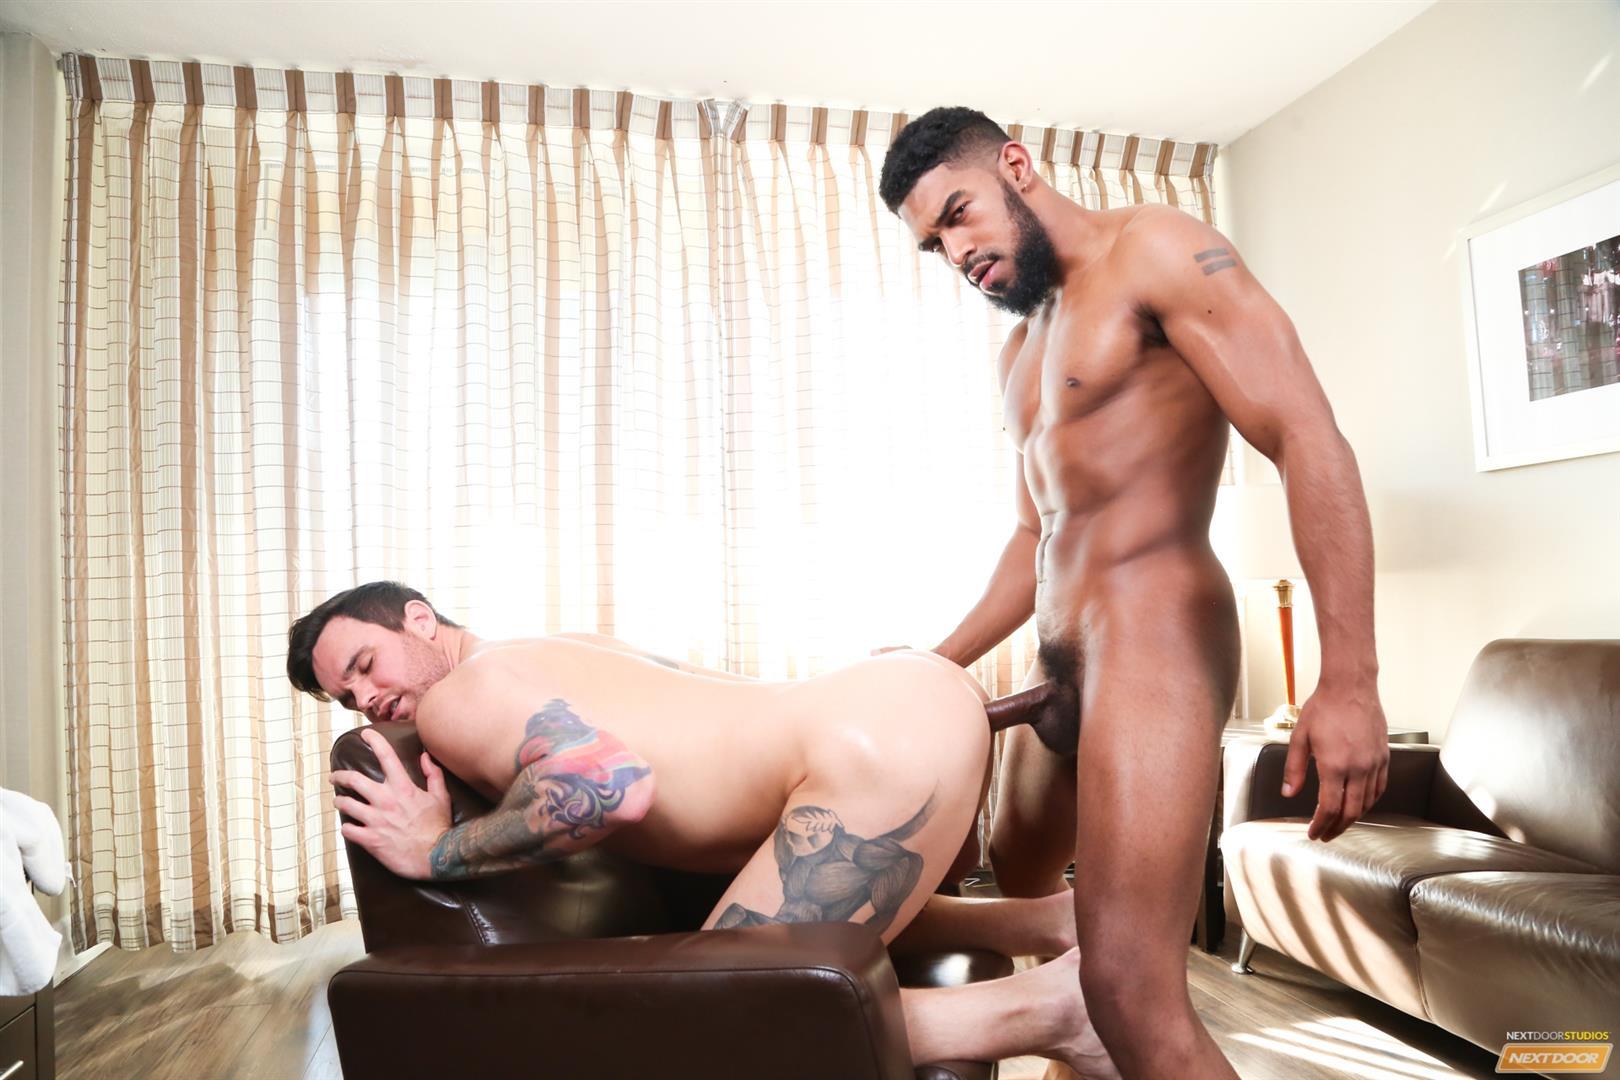 Next-Door-Ebony-XL-and-Beau-Reed-Interracial-bareback-fucking-big-black-cock-12 Bareback Flip Fucking With A Big Black Cock And A Hot White Ass